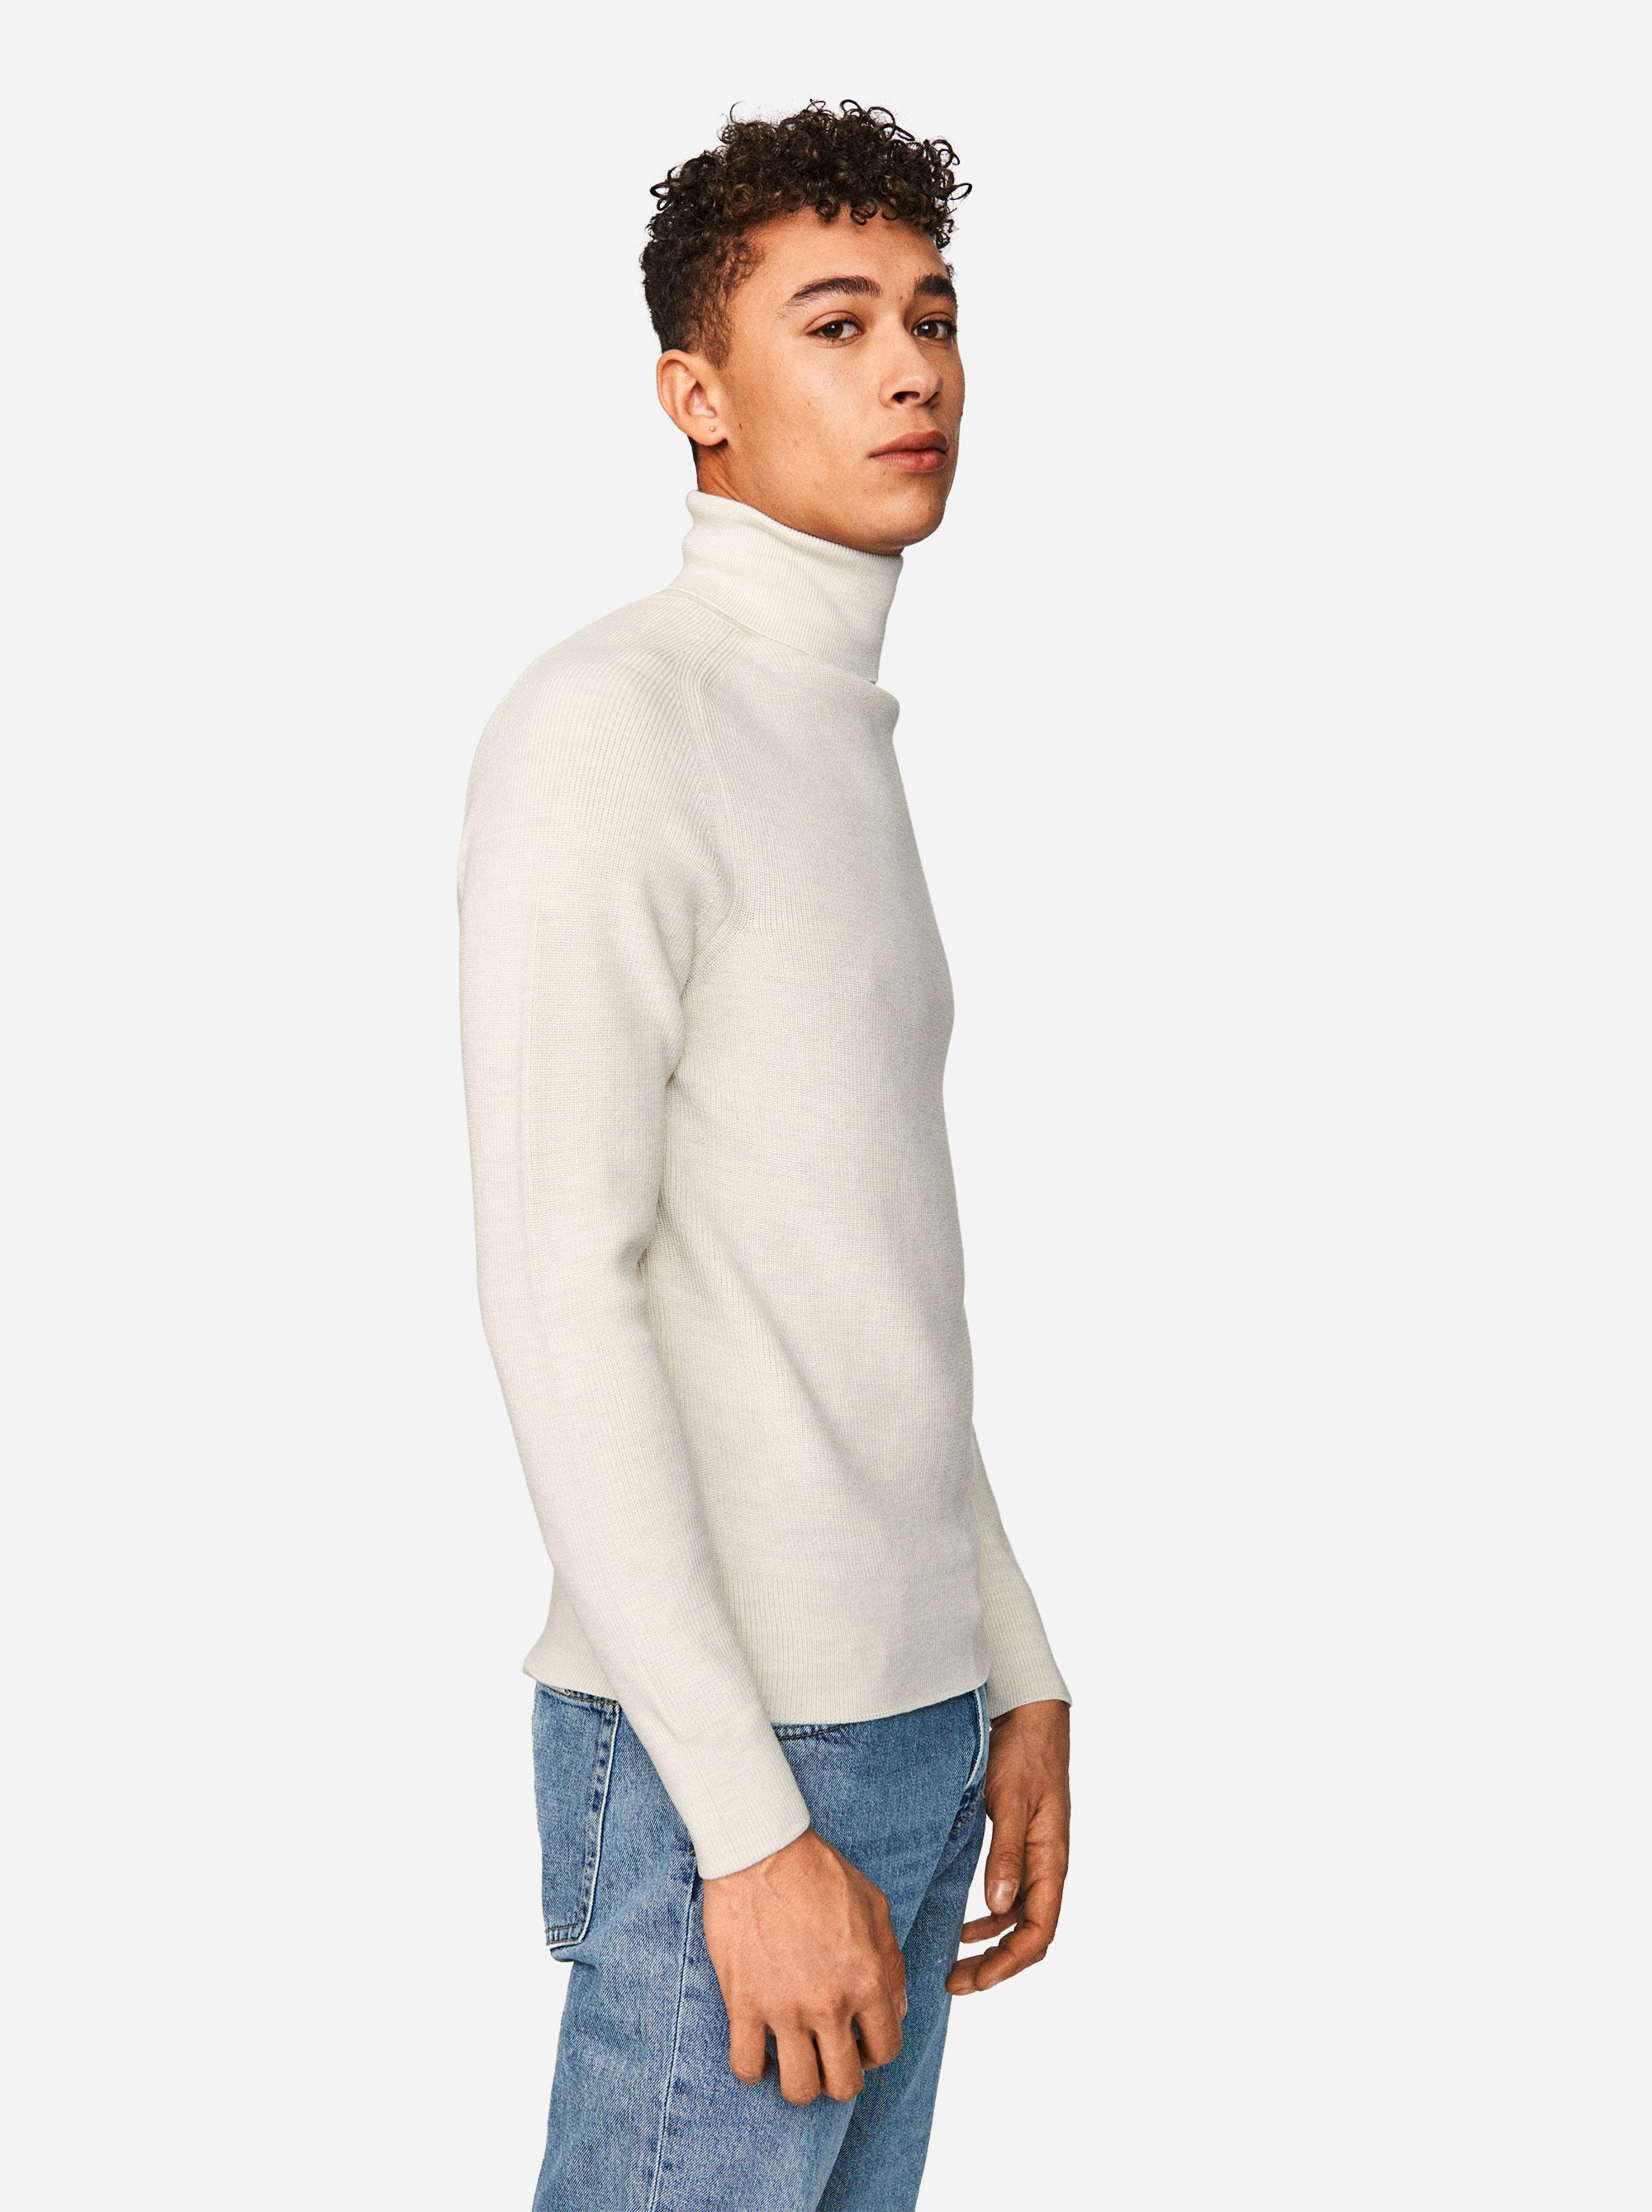 Teym - Turtleneck - The Merino Sweater - Men - White - 3